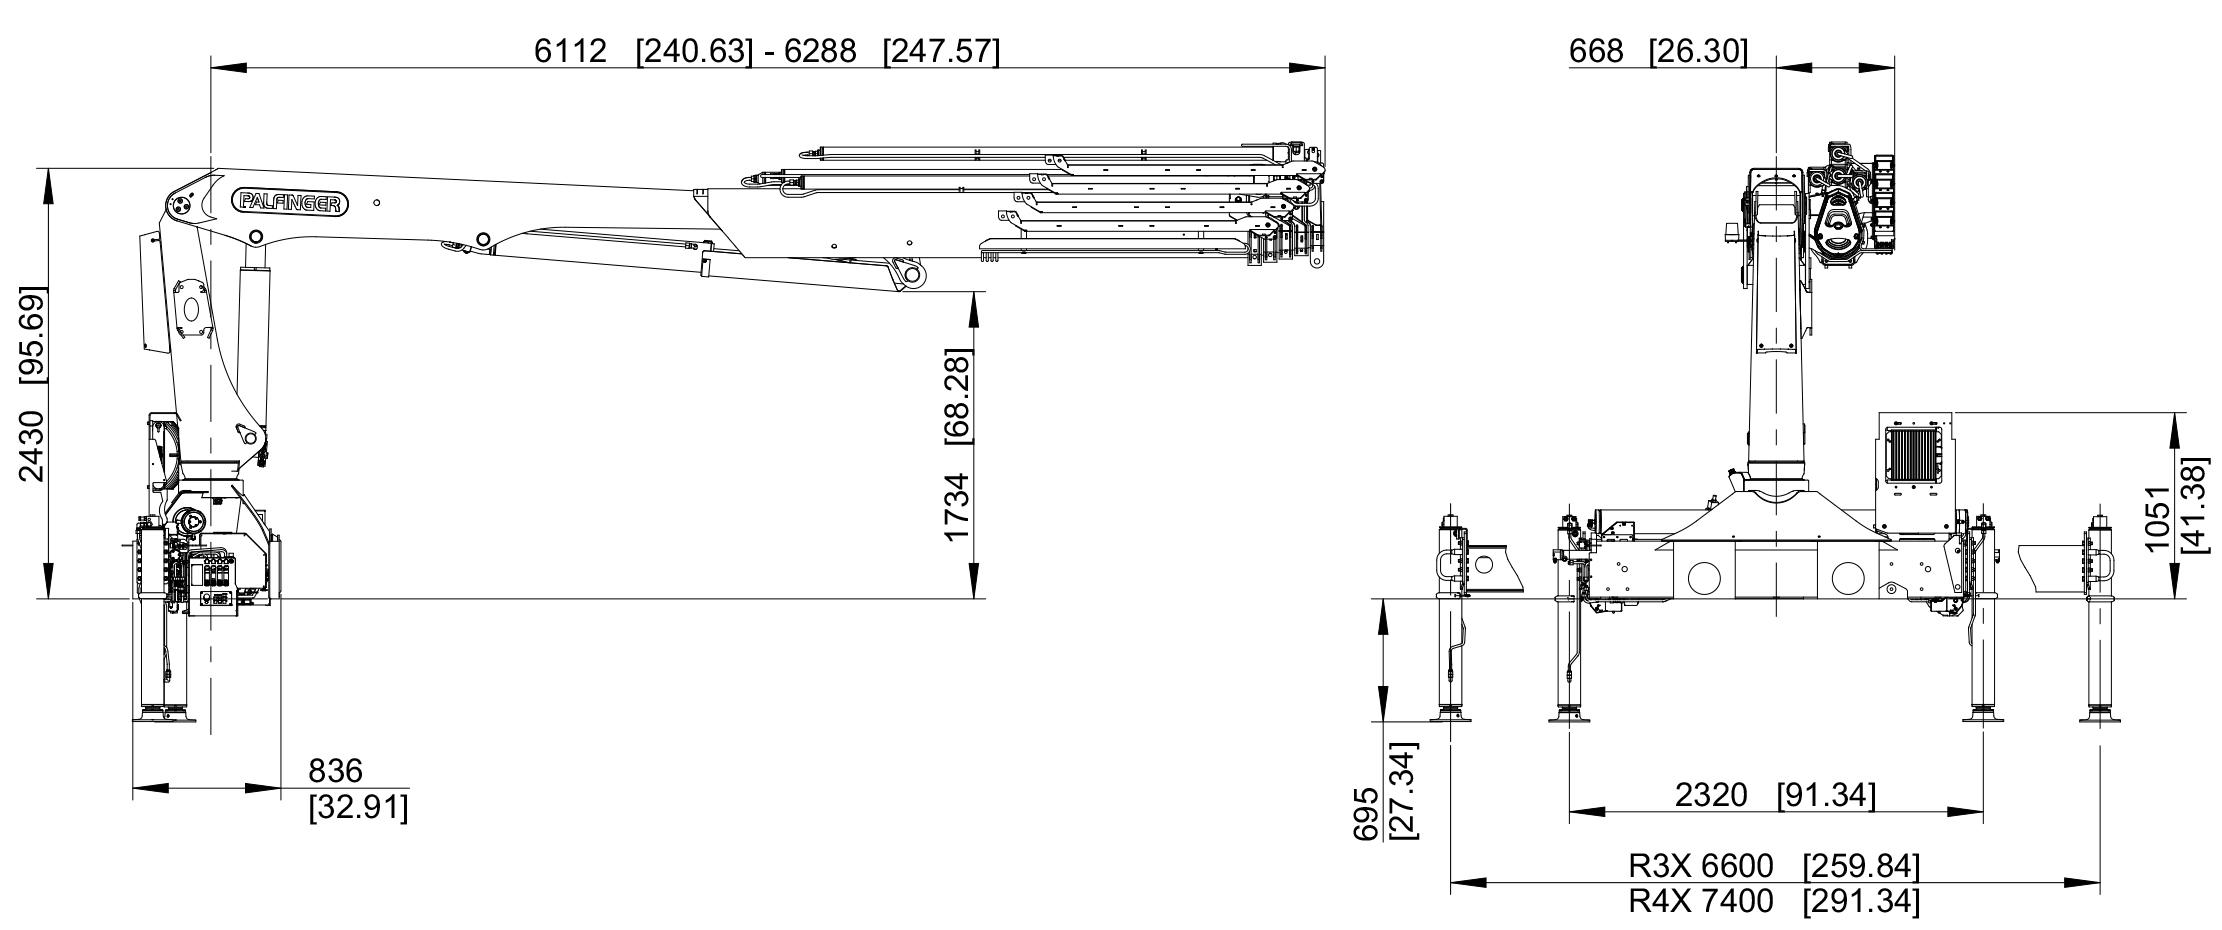 pk%2026001%20l%20tec7_drawing Welltec E Wiring Diagram on